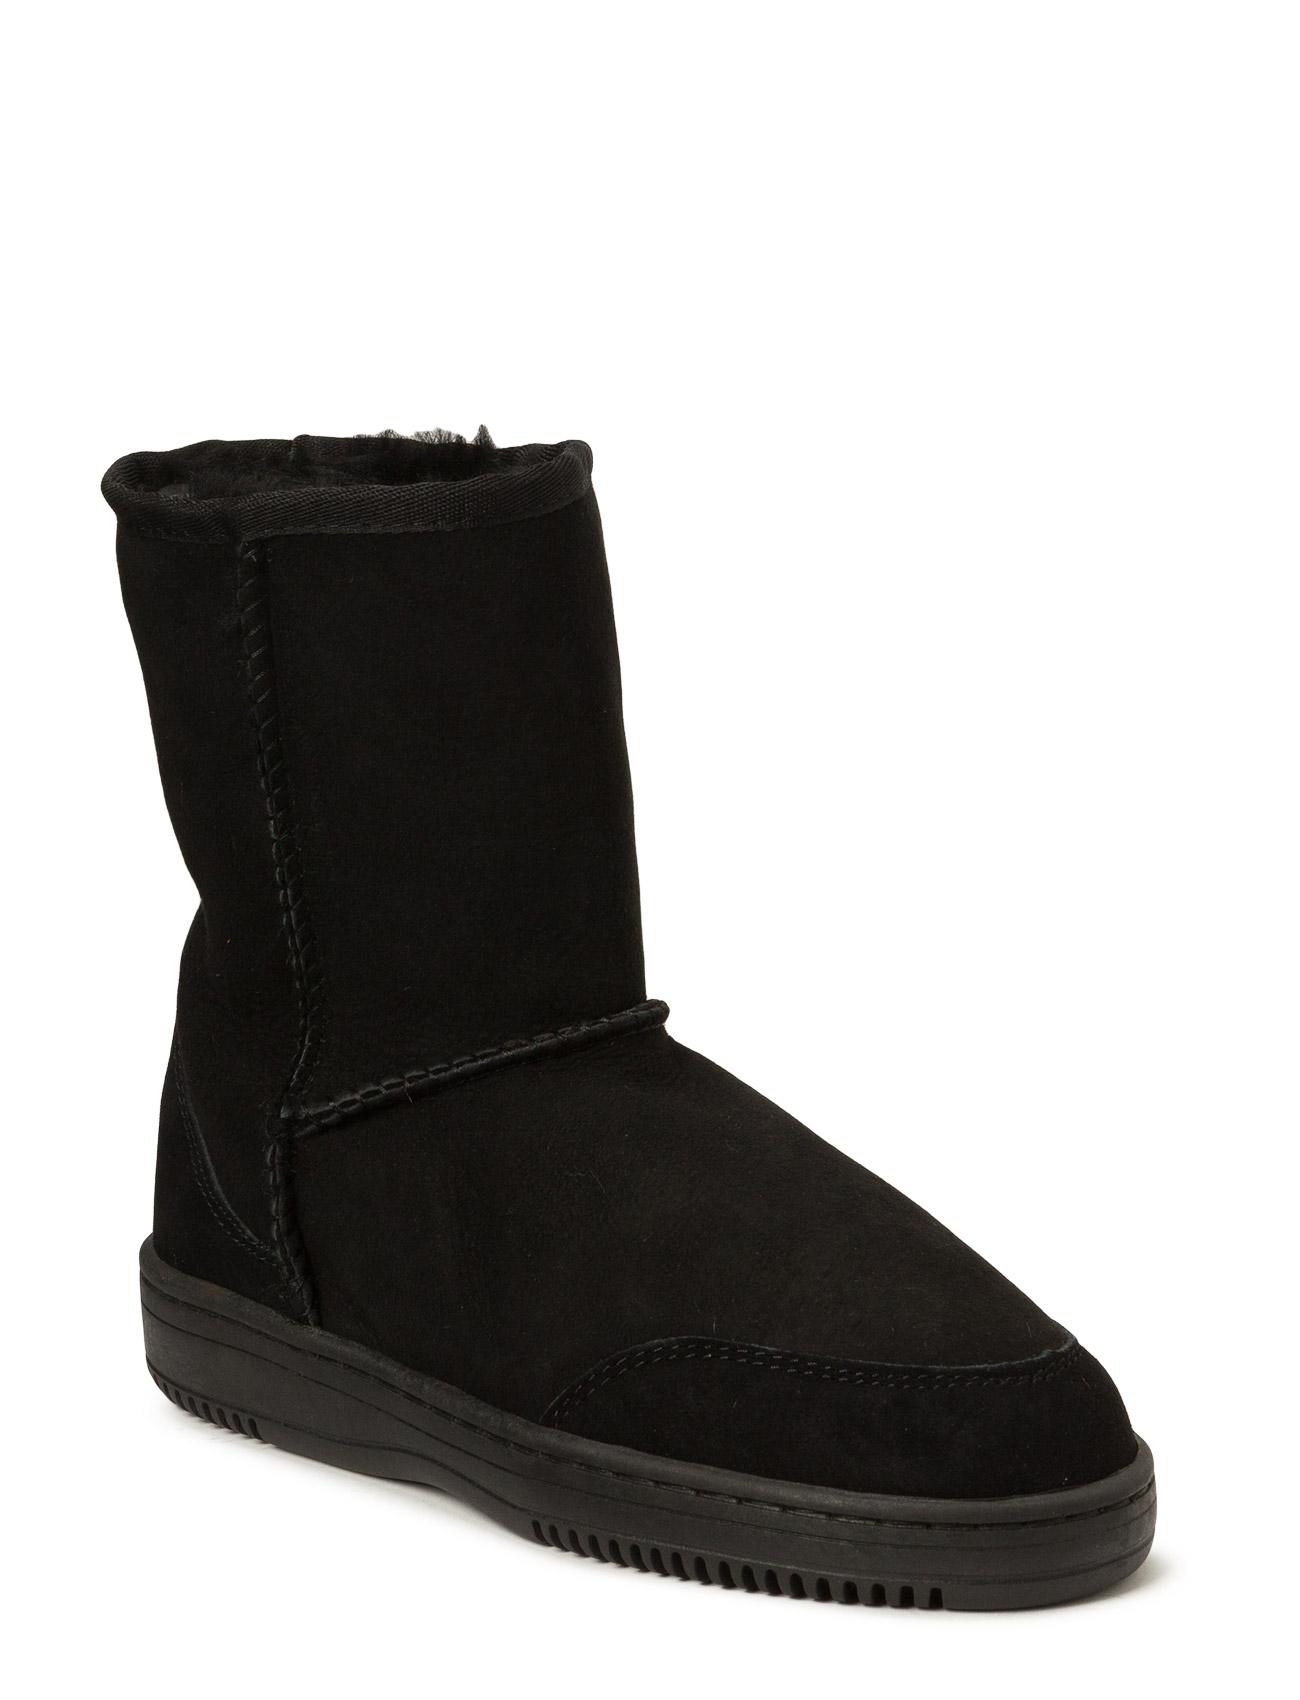 Short New Zealand Boots Støvler til Damer i Sort